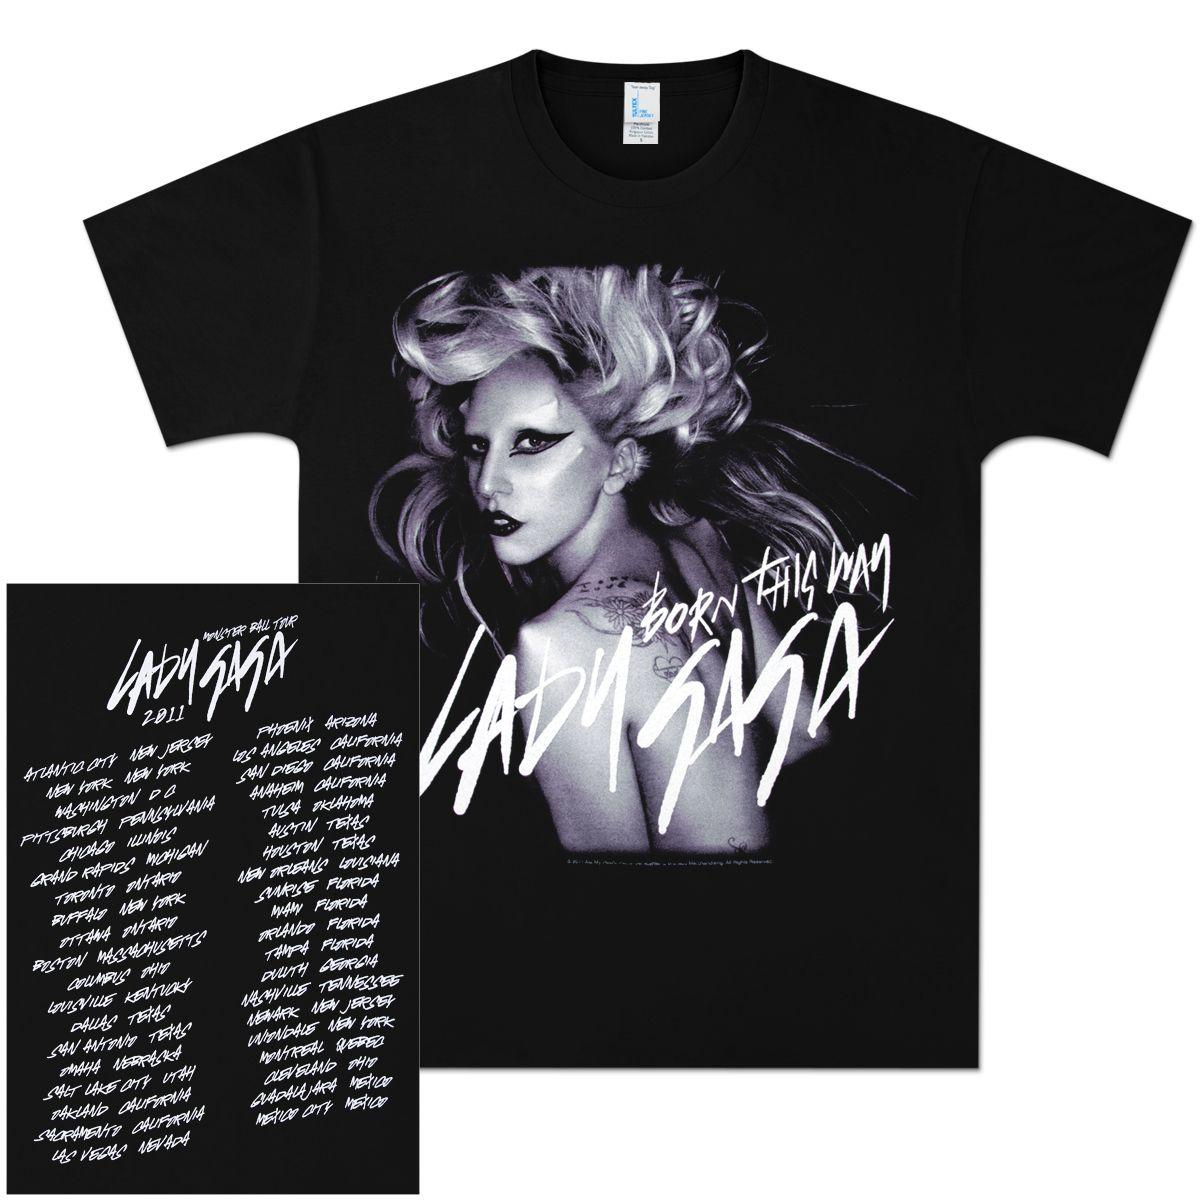 Monster Ball Tour T Shirt Most Amazing Night Tour T Shirts Shirt Shop Lady Gaga